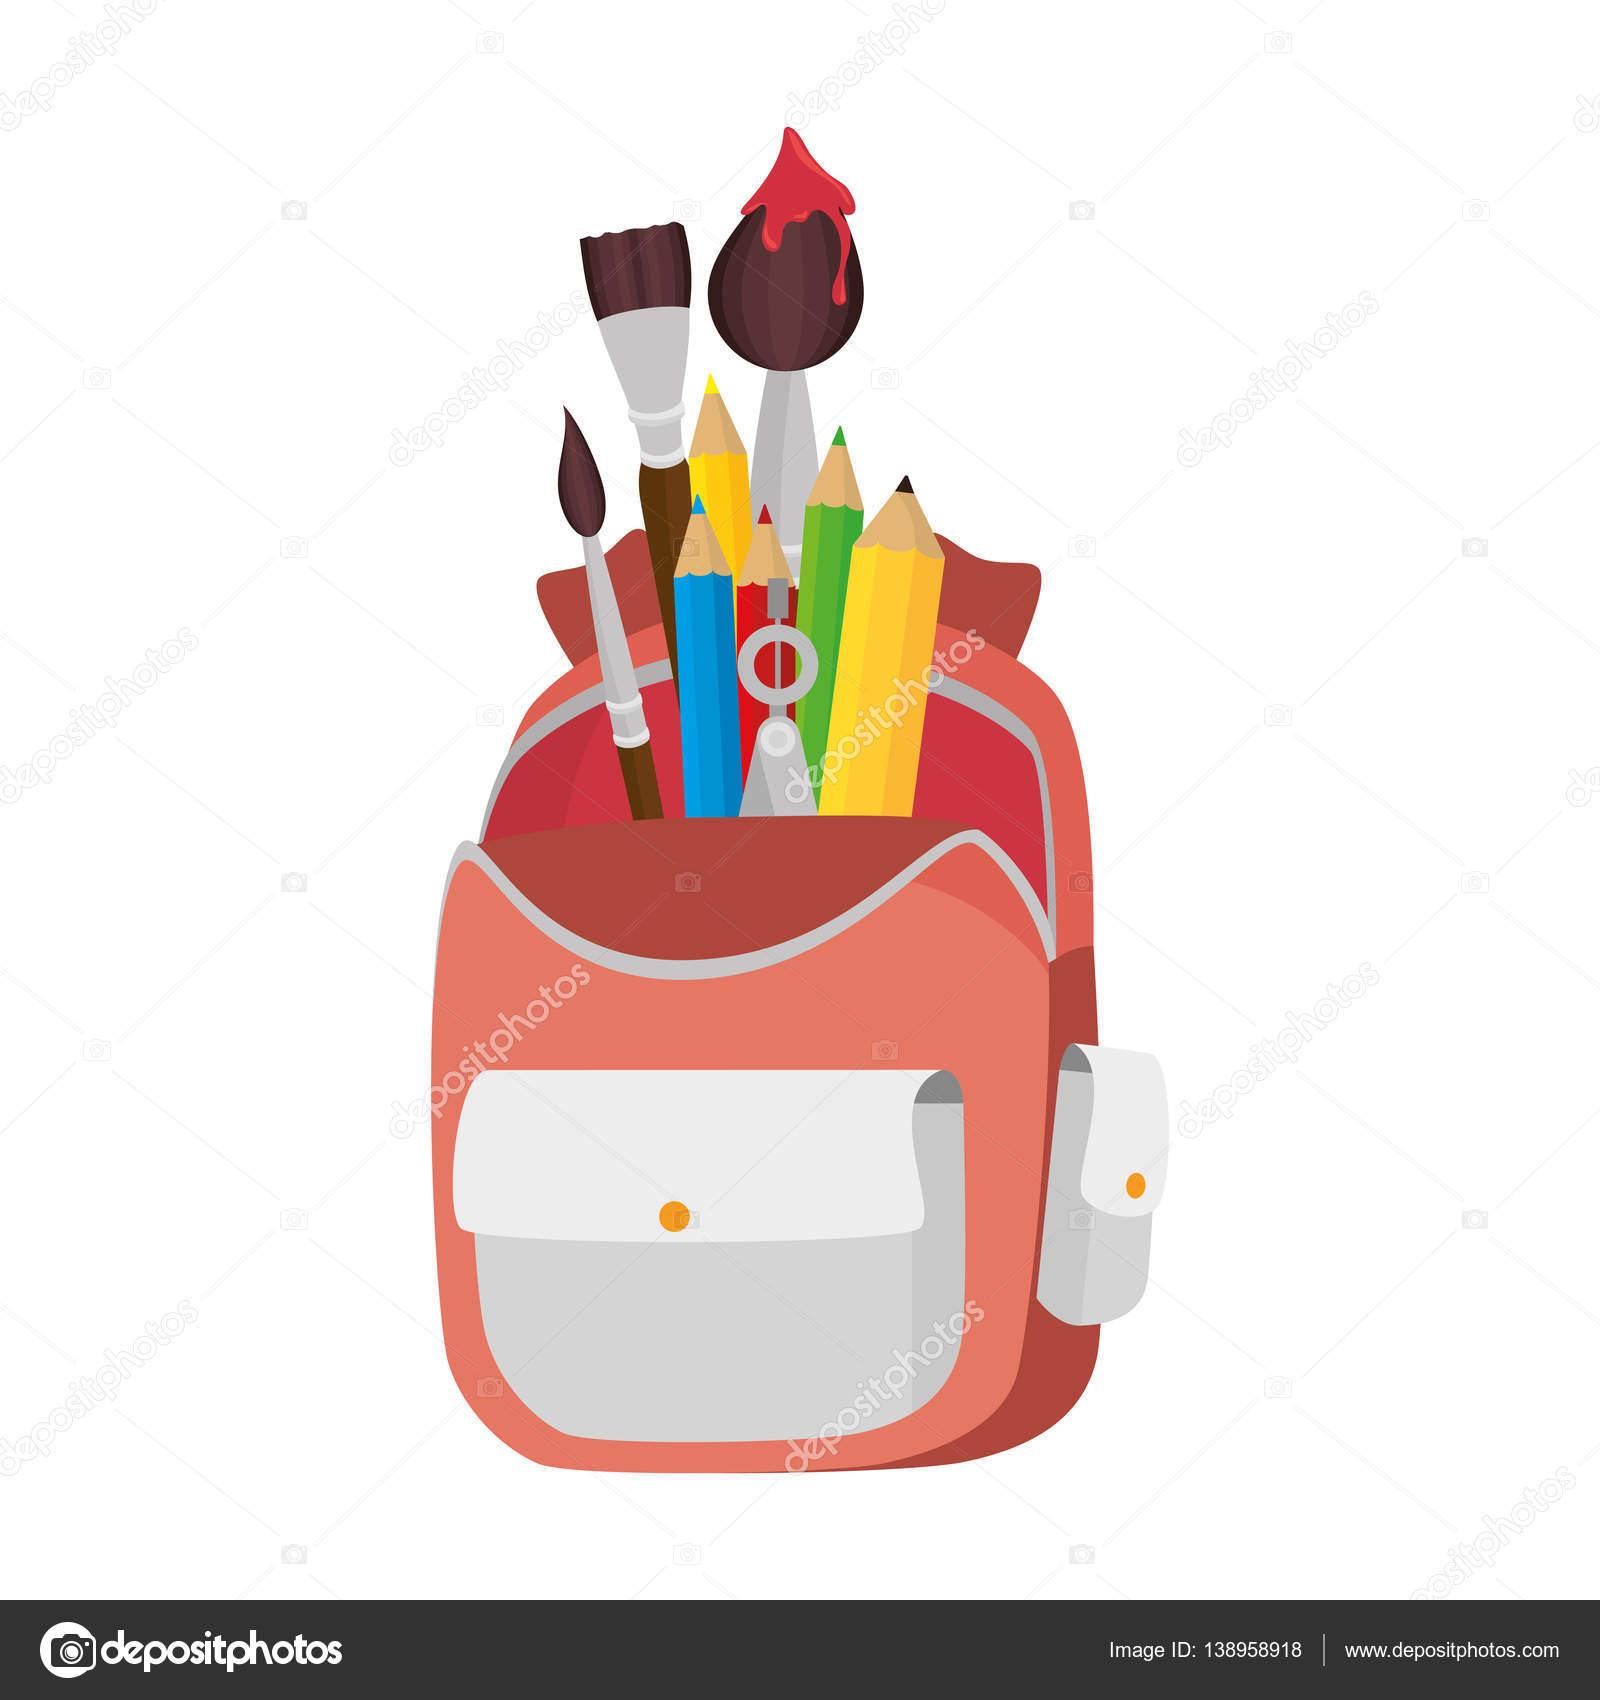 School bag diagram - School Bag Equipment Icon Stock Vector 138958918